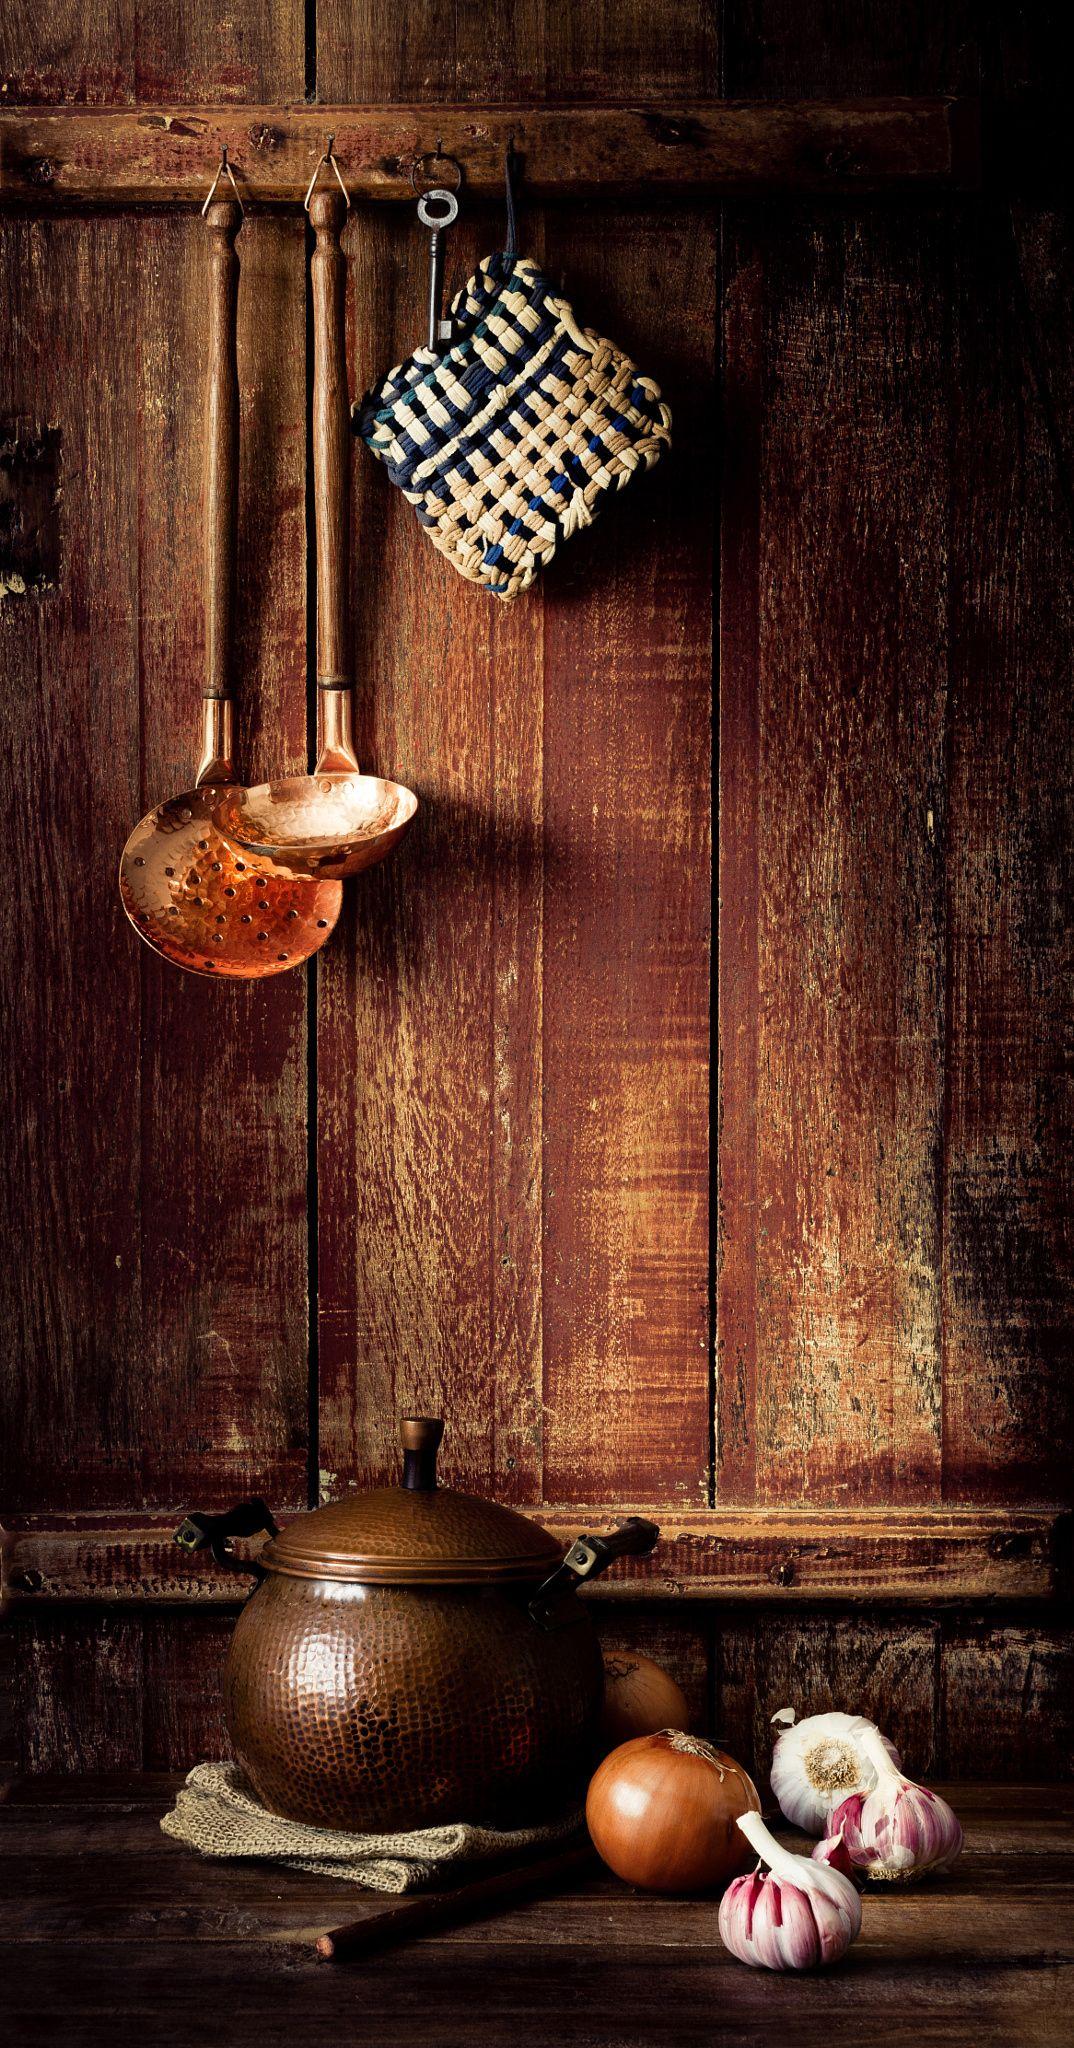 La Cucina By Luiz Laercio On 500px Copper Crush Pinterest